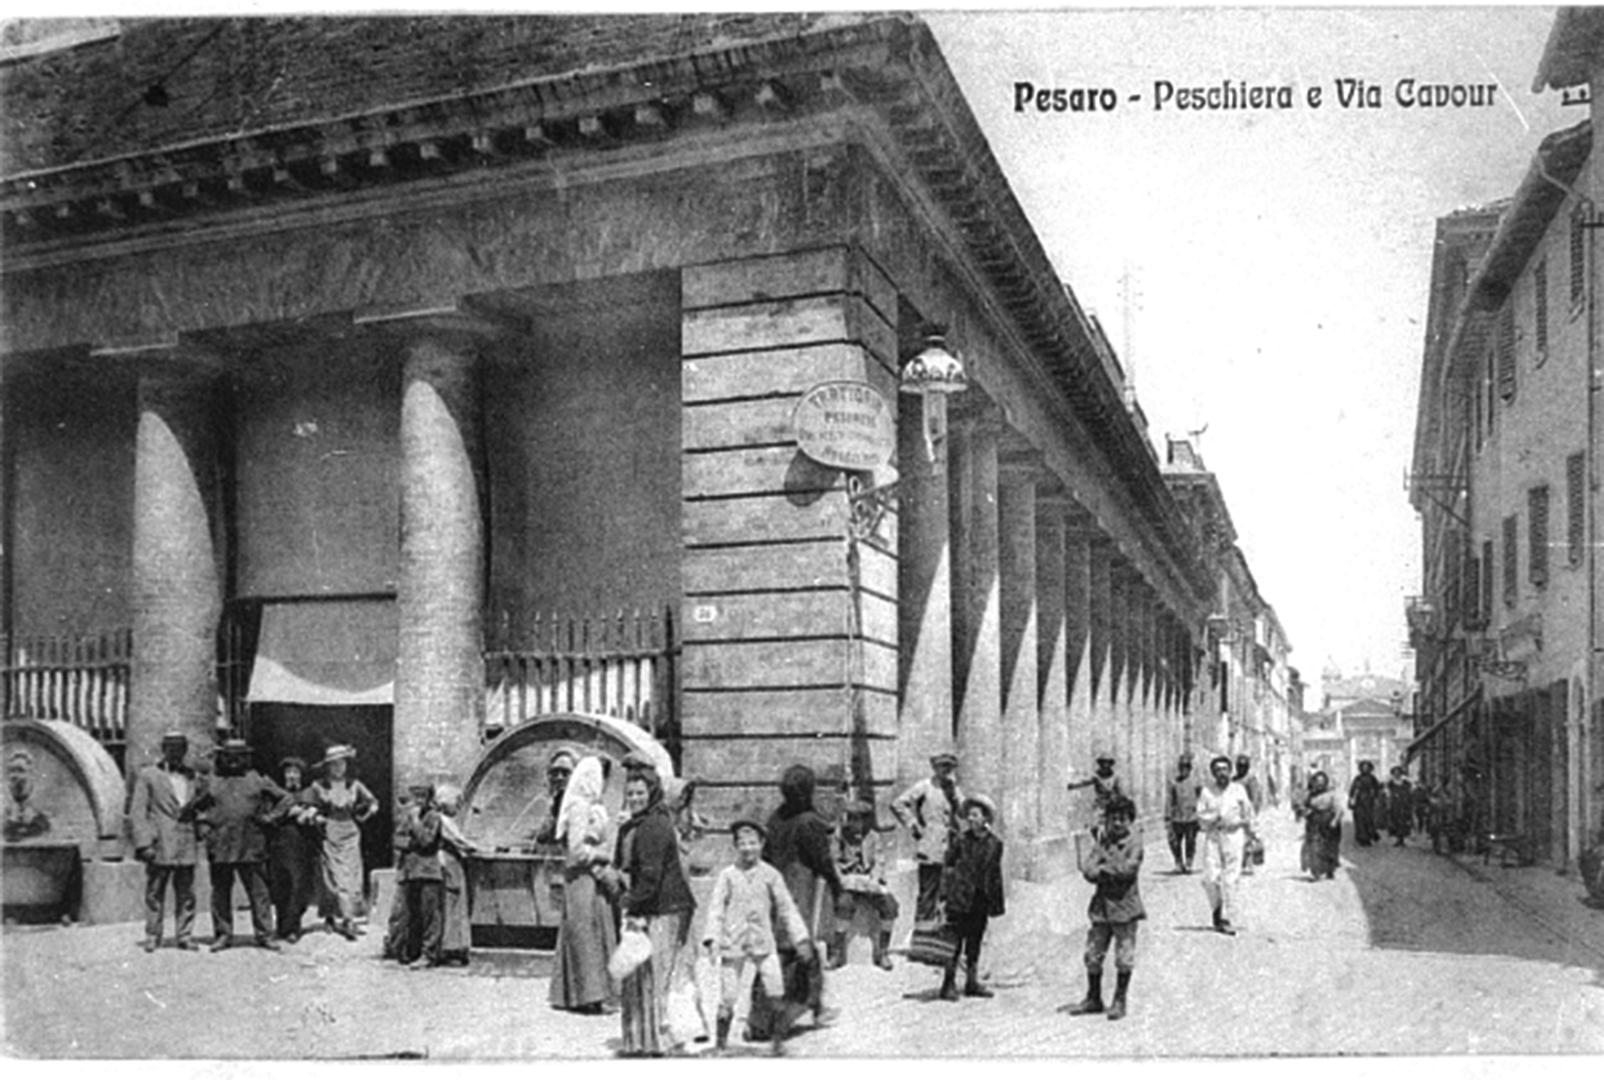 La Pescheria - Pesaro